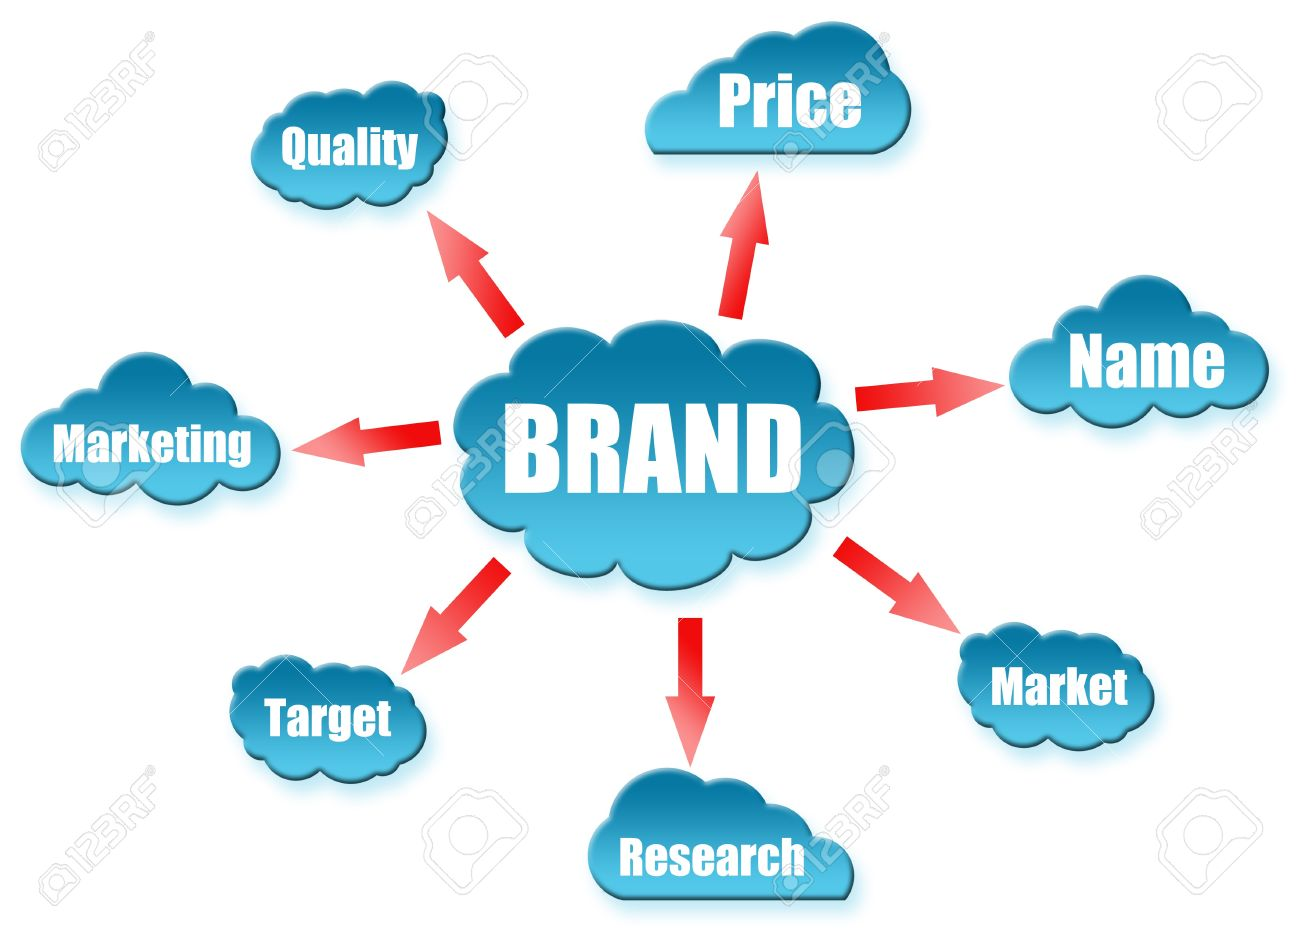 Brand word on cloud scheme Stock Photo - 11615061